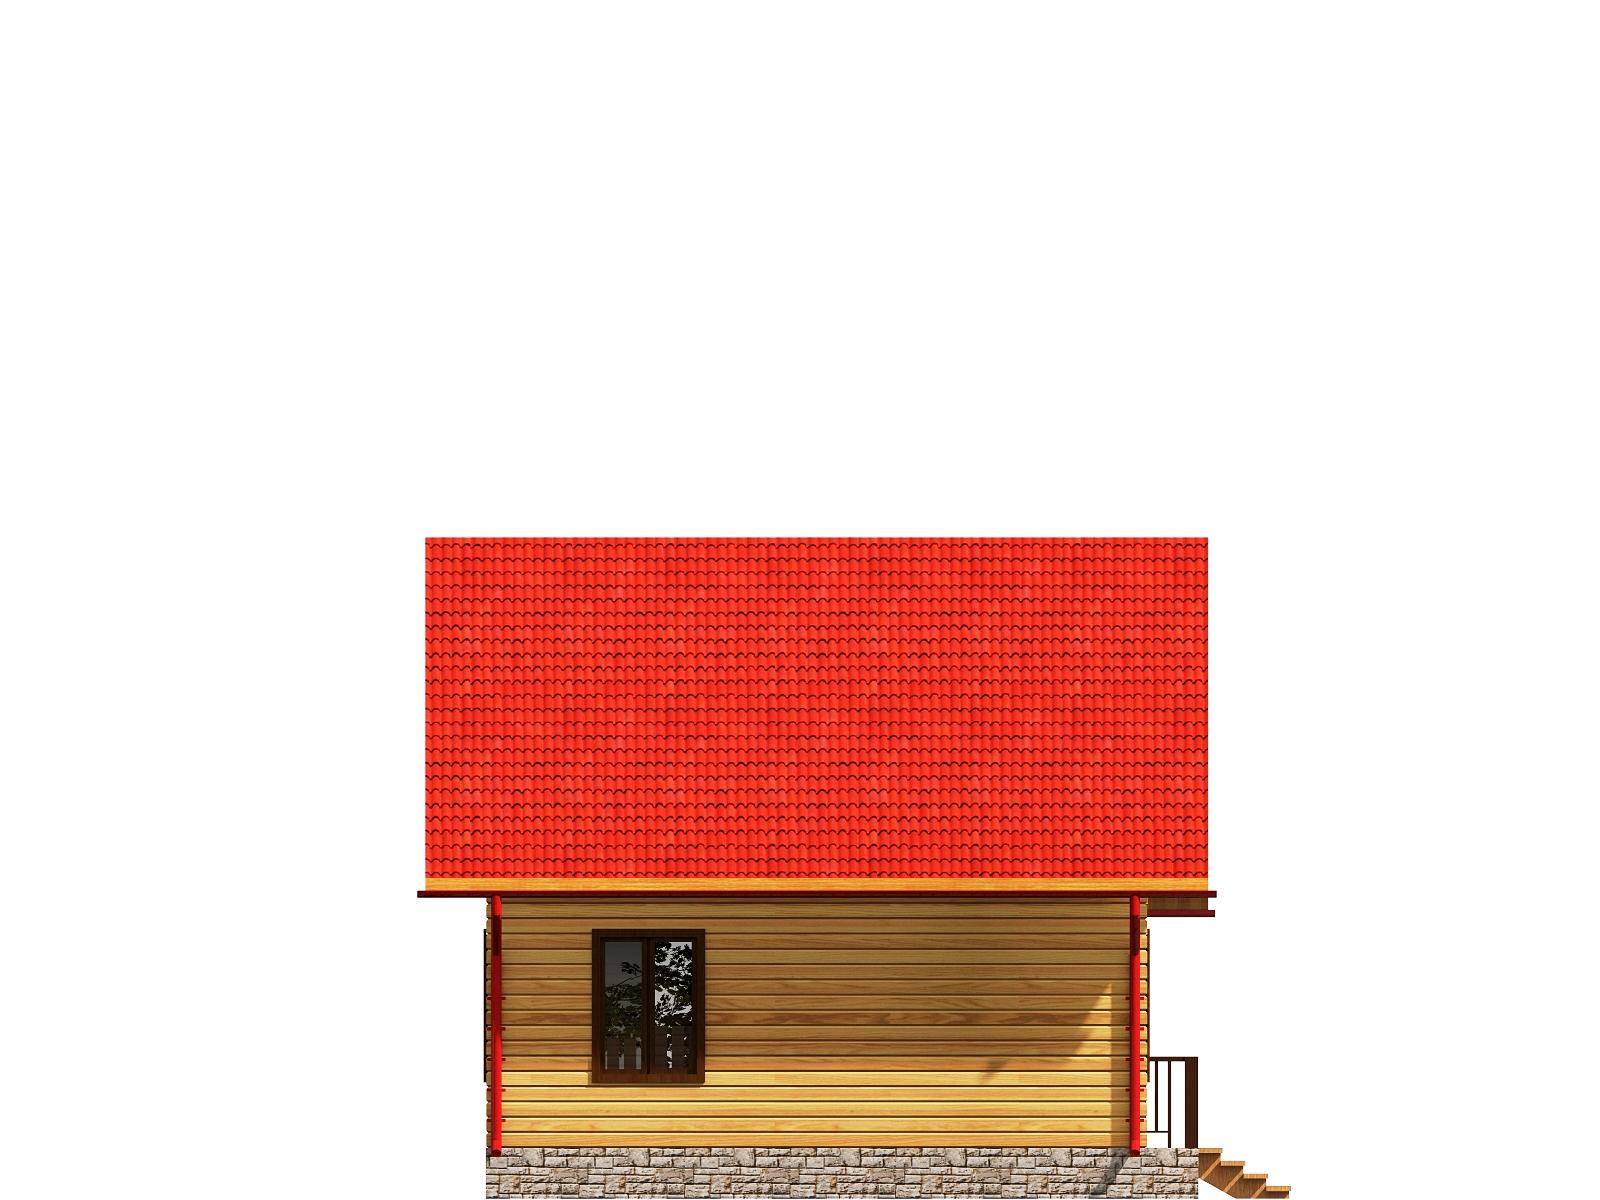 Проект дома из бруса 6,7х8 с мансардой. Разрез 4.